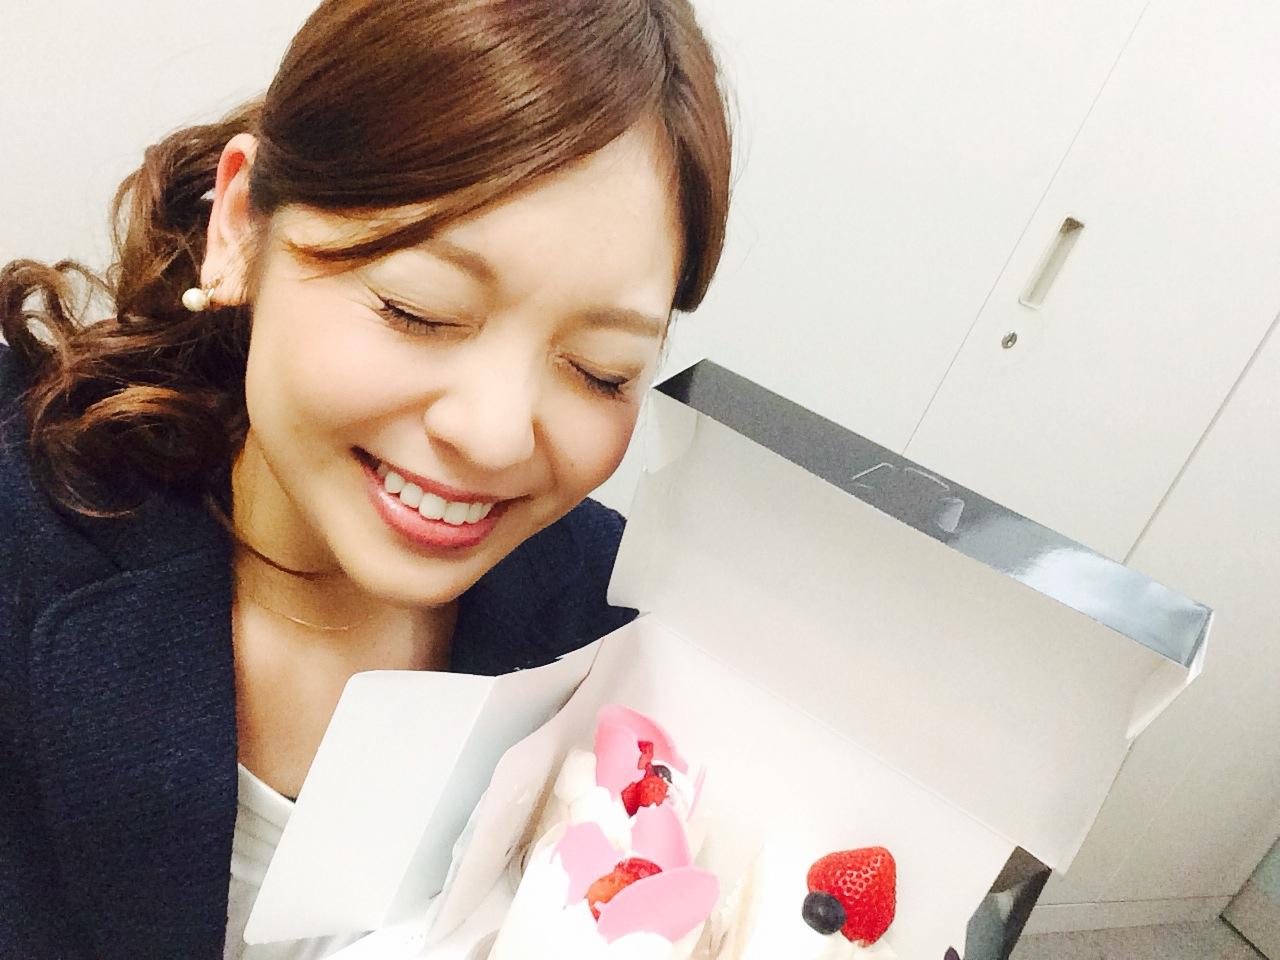 森夏美 (1995年生)の画像 p1_29